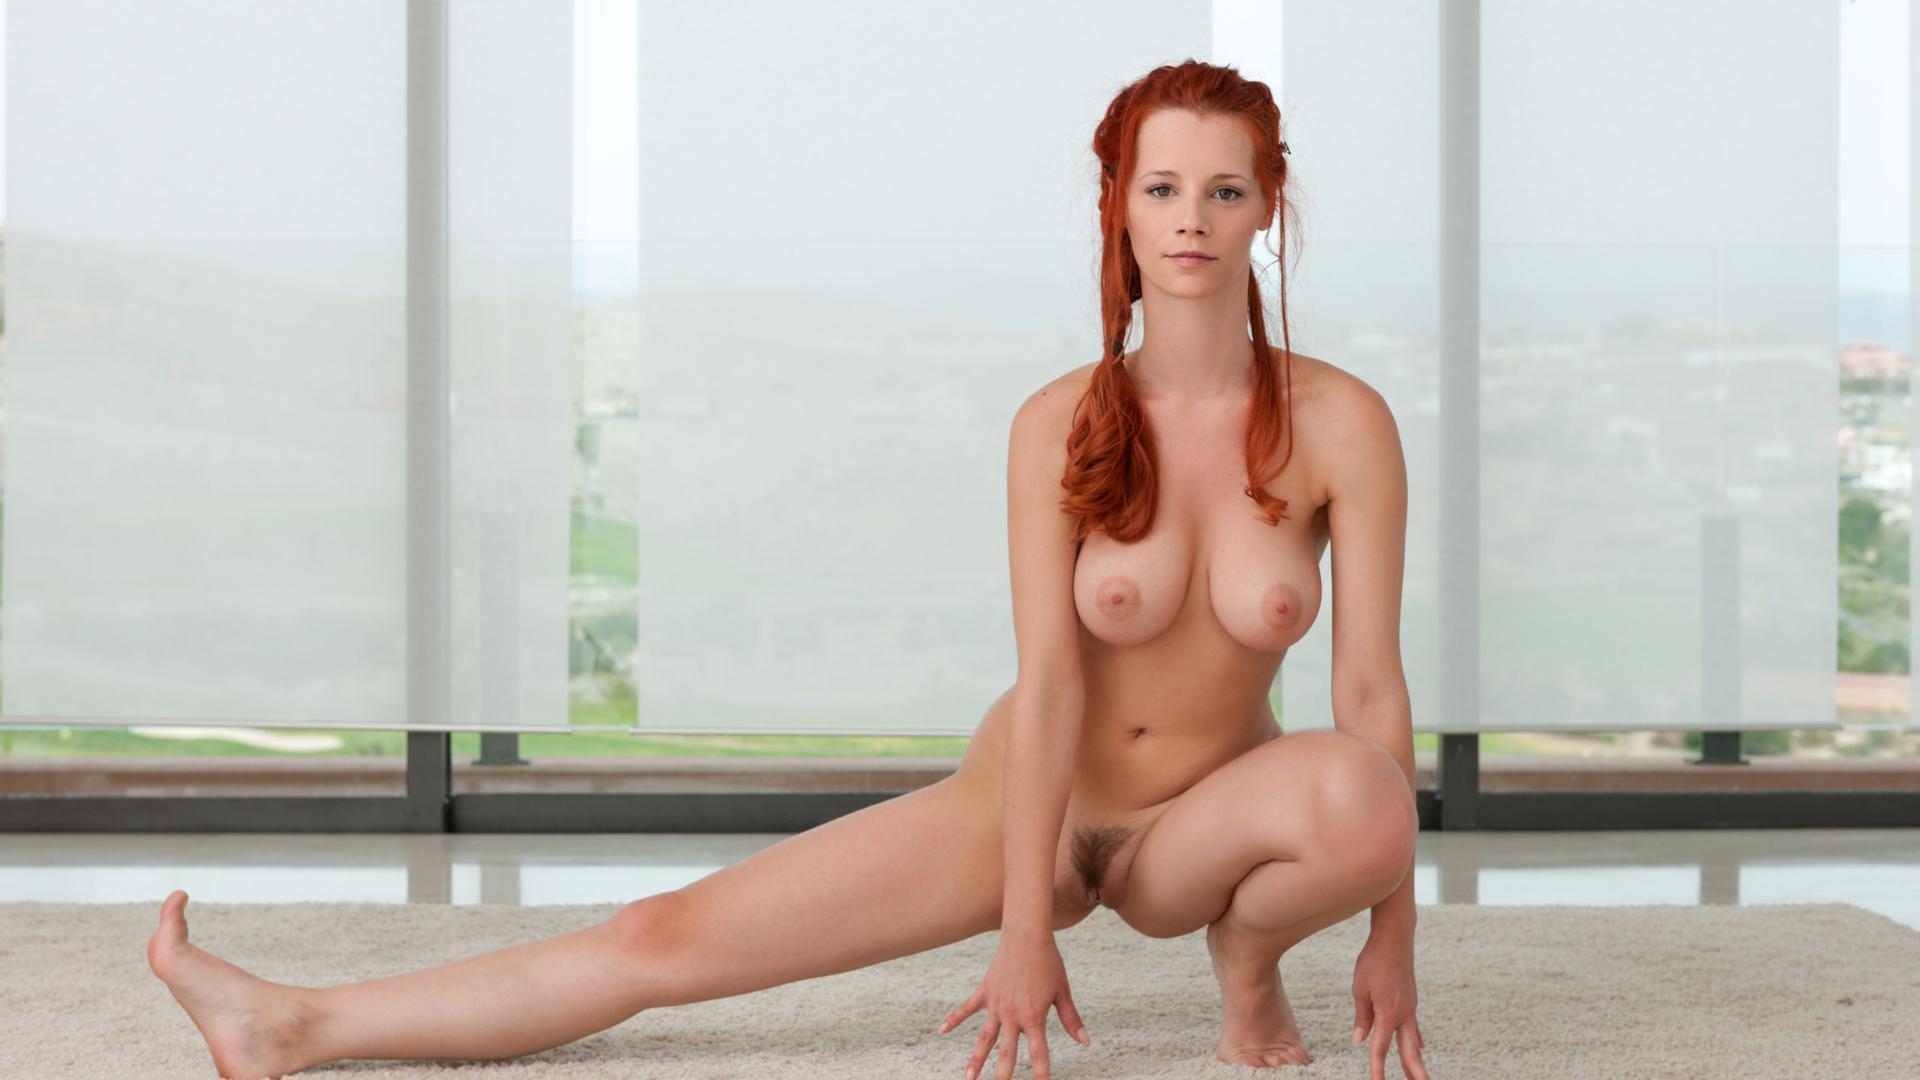 Yoga boobs